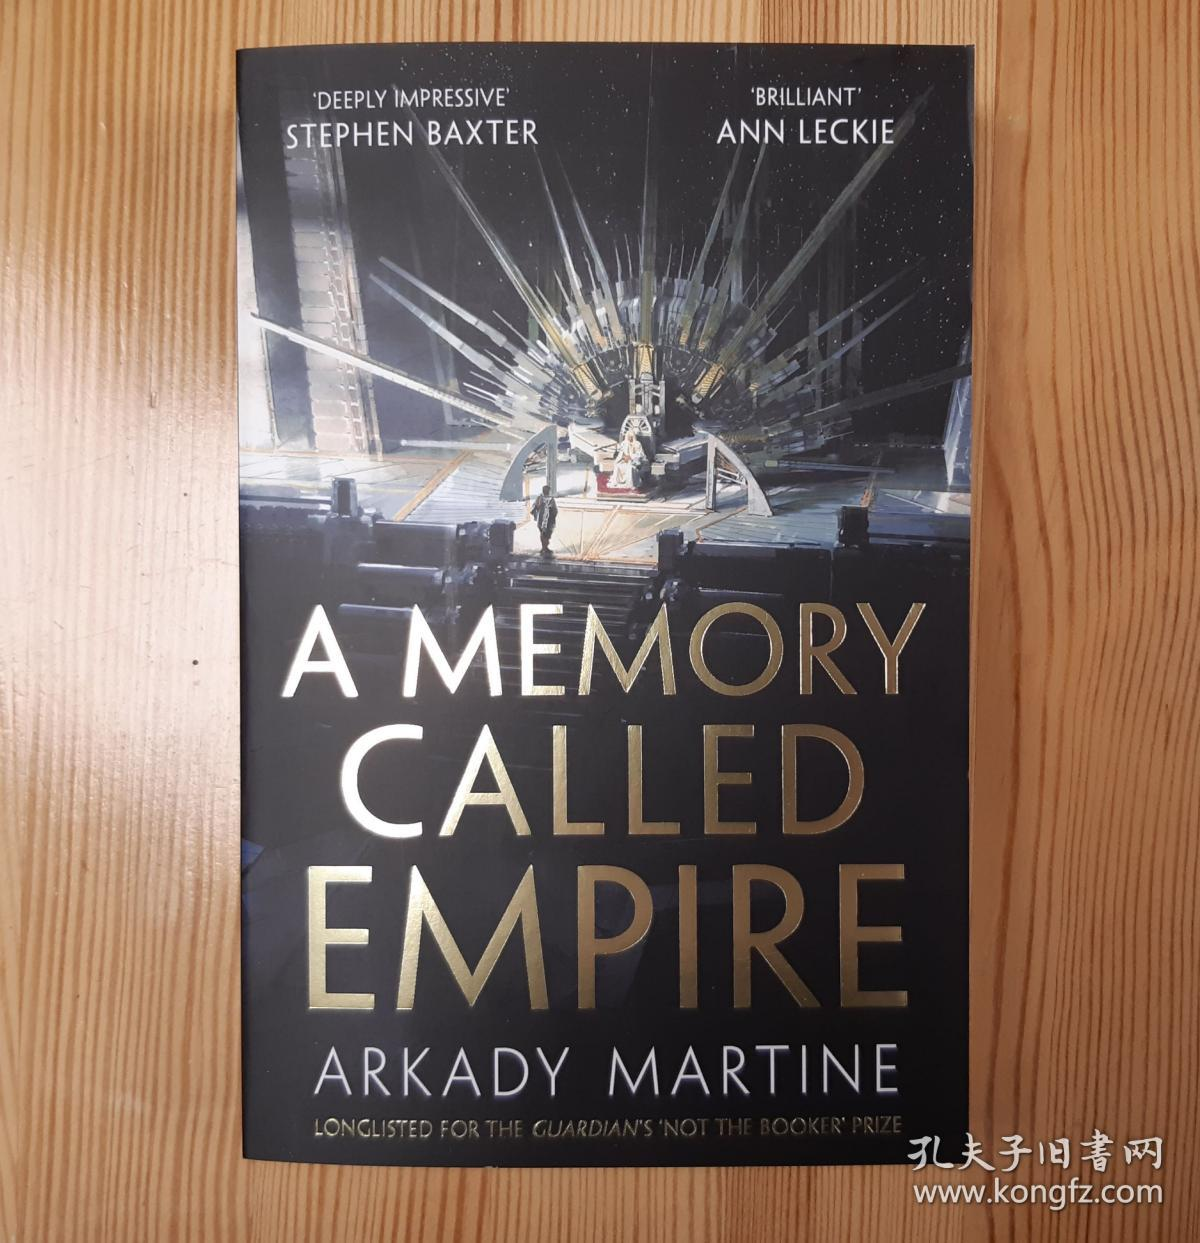 预售帝国的回忆 英版平装 2020年雨果奖最佳长篇小说 阿卡迪·马丁 A Memory Called Empire : Winner of the 2020 Hugo Award for Best Novel  paperback